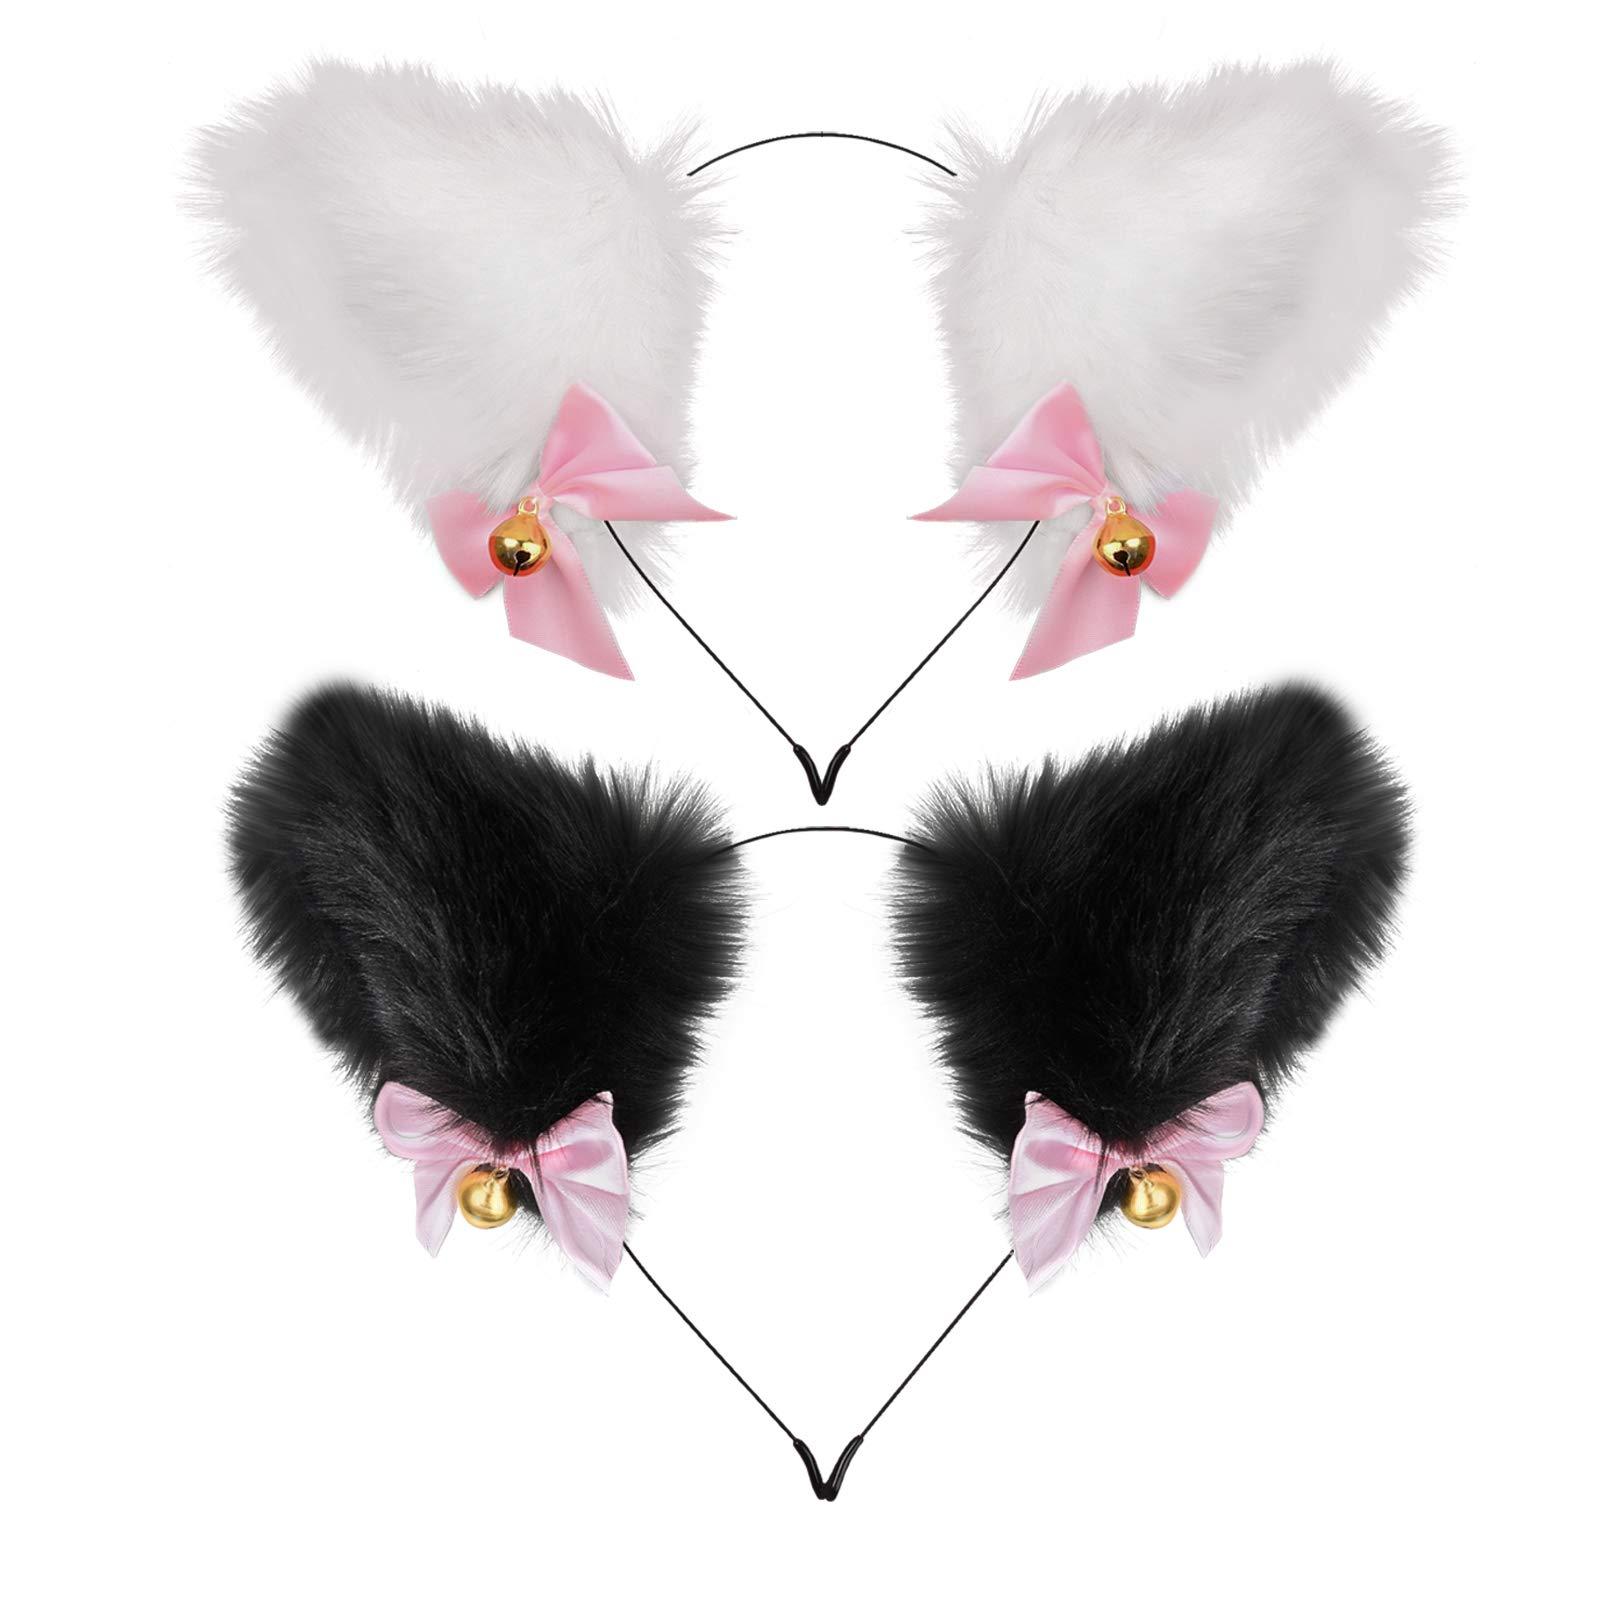 Cosplay Headwear Plush Furry Cat Ear Headband Cute Anime Fox Ears Bell Bows Headpiece Custume Party Halloween Hair Accessory for Ladies and Women ( White , Black )